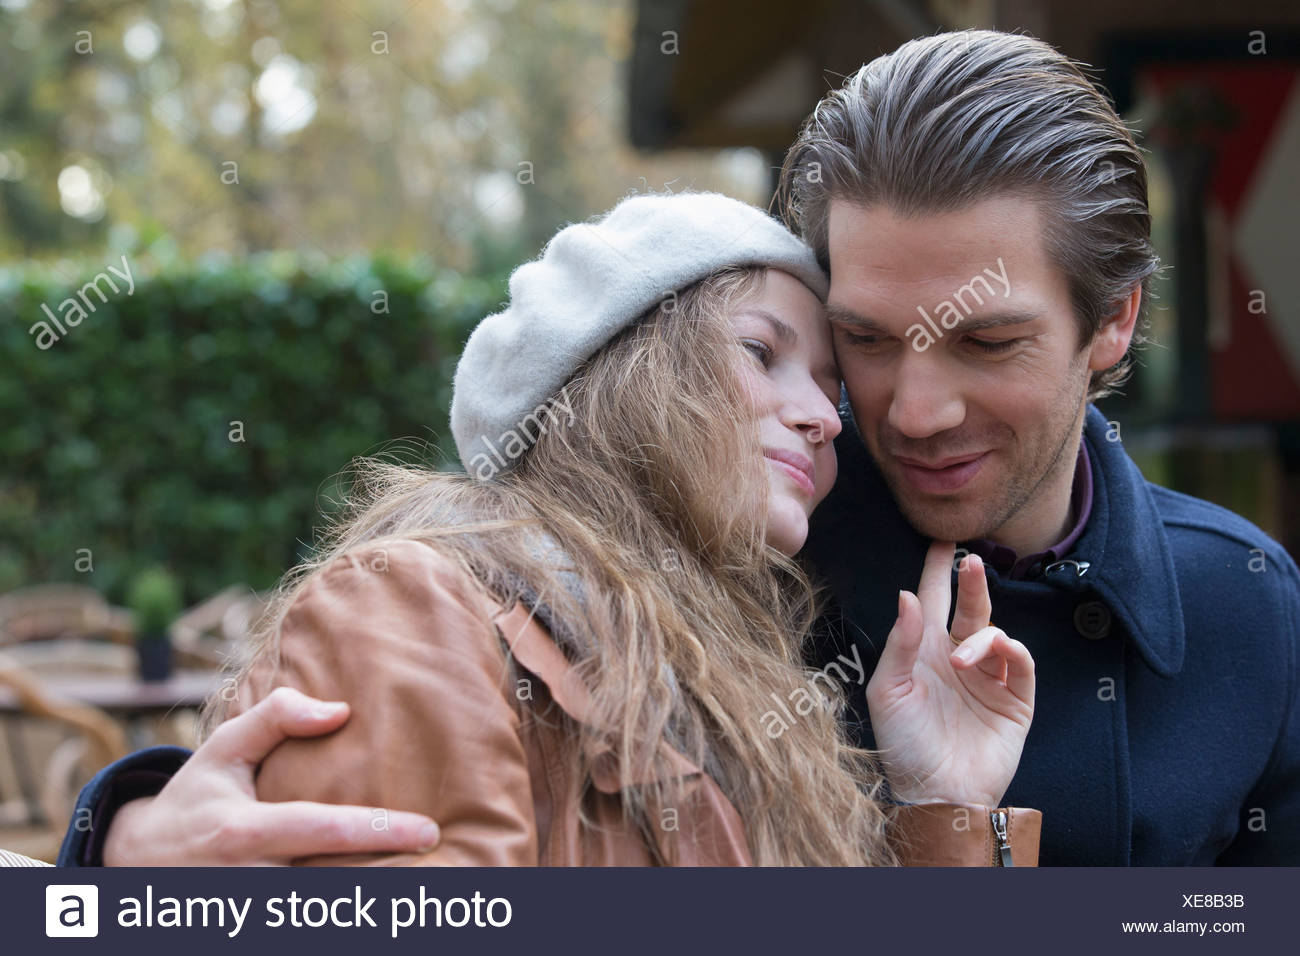 Couple hugging, arm around - Stock Image